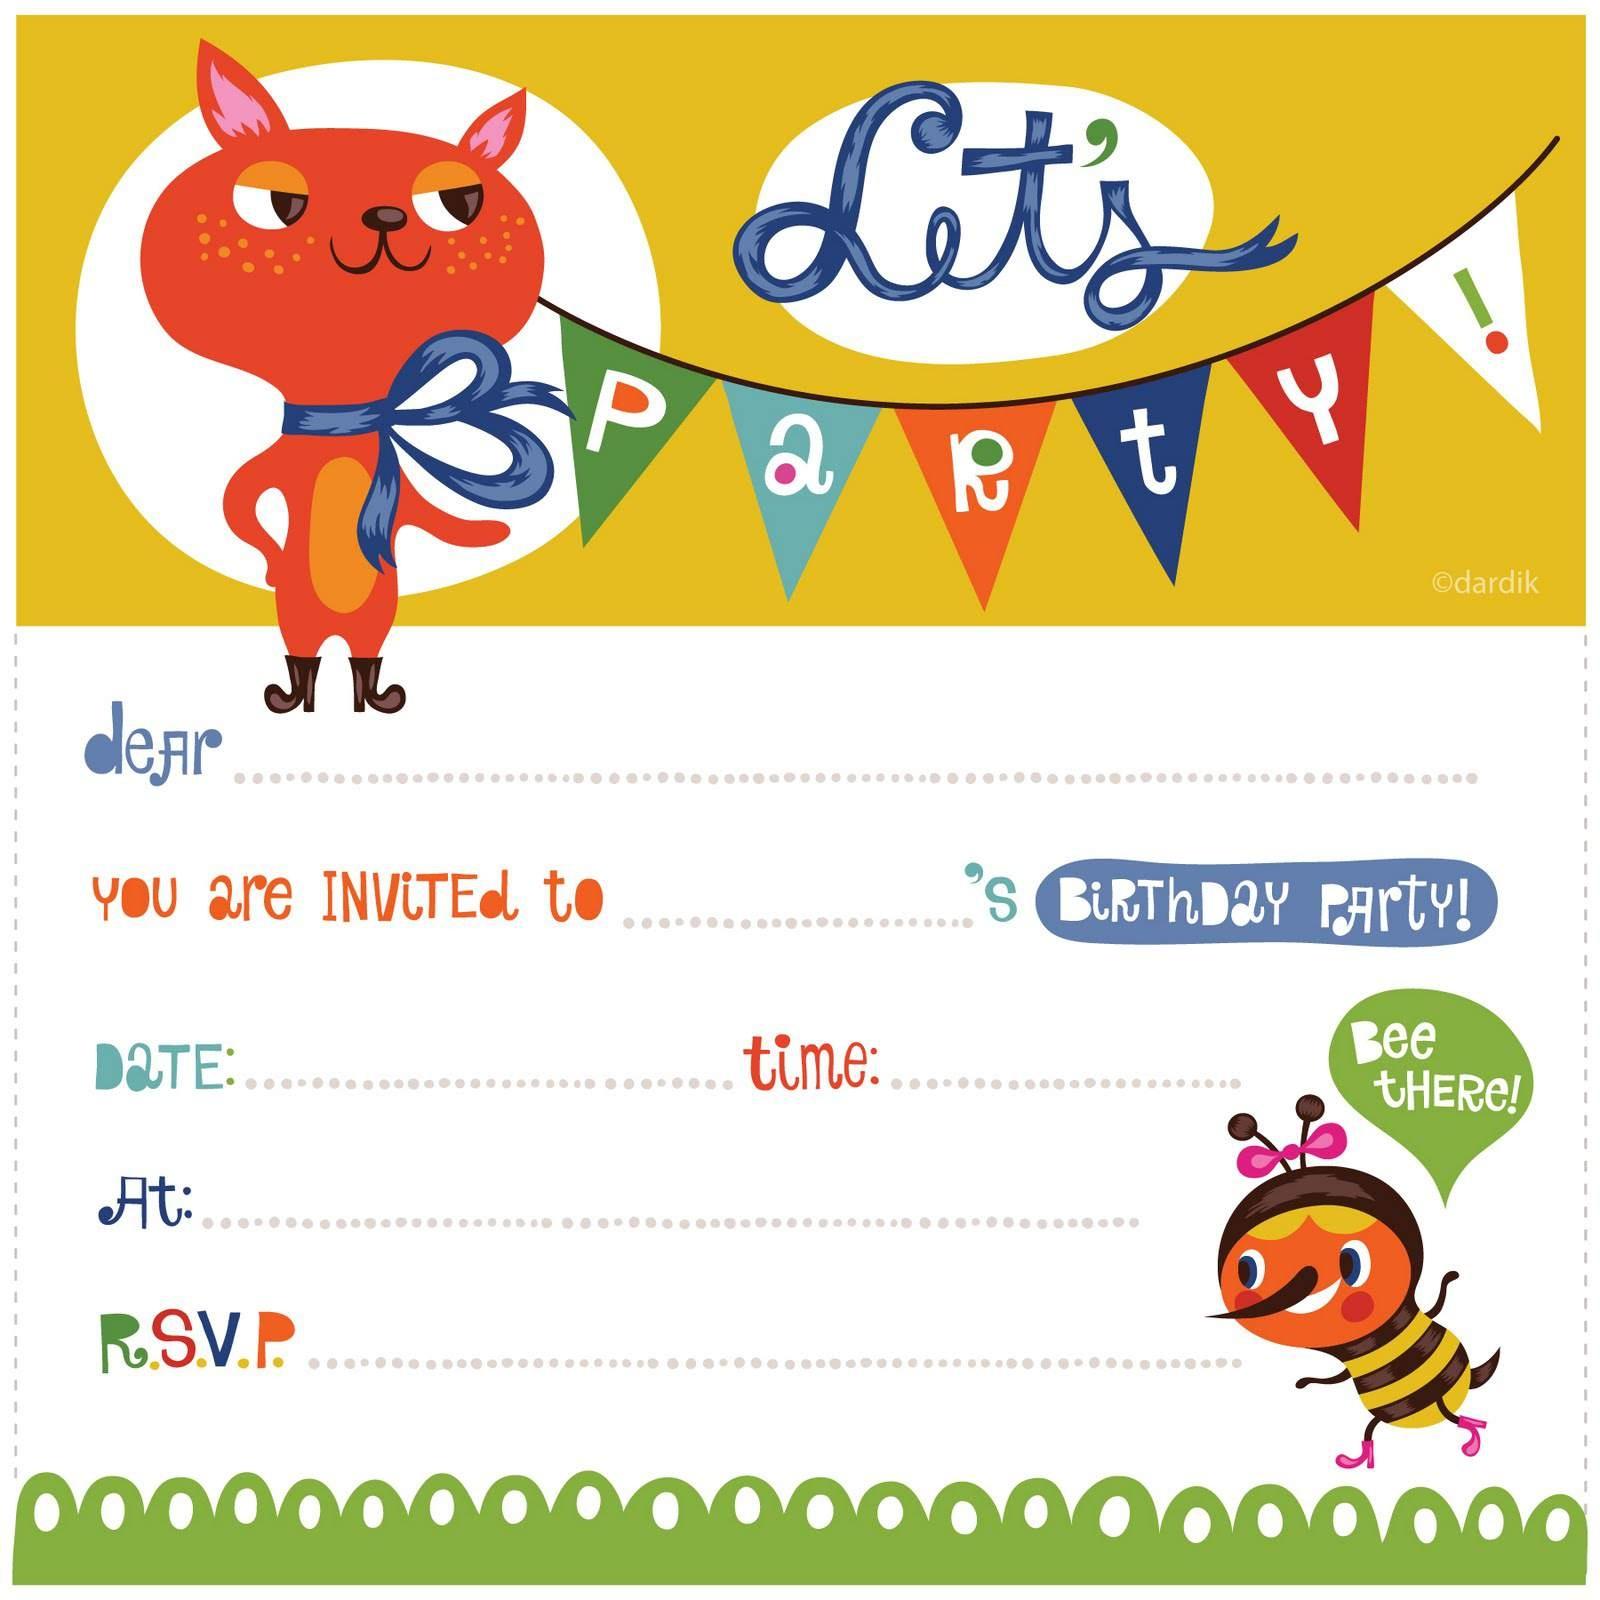 Free Printable Birthday Invitations For Kids Parties - Tutlin.psstech.co - Free Printable Birthday Invitations For Kids